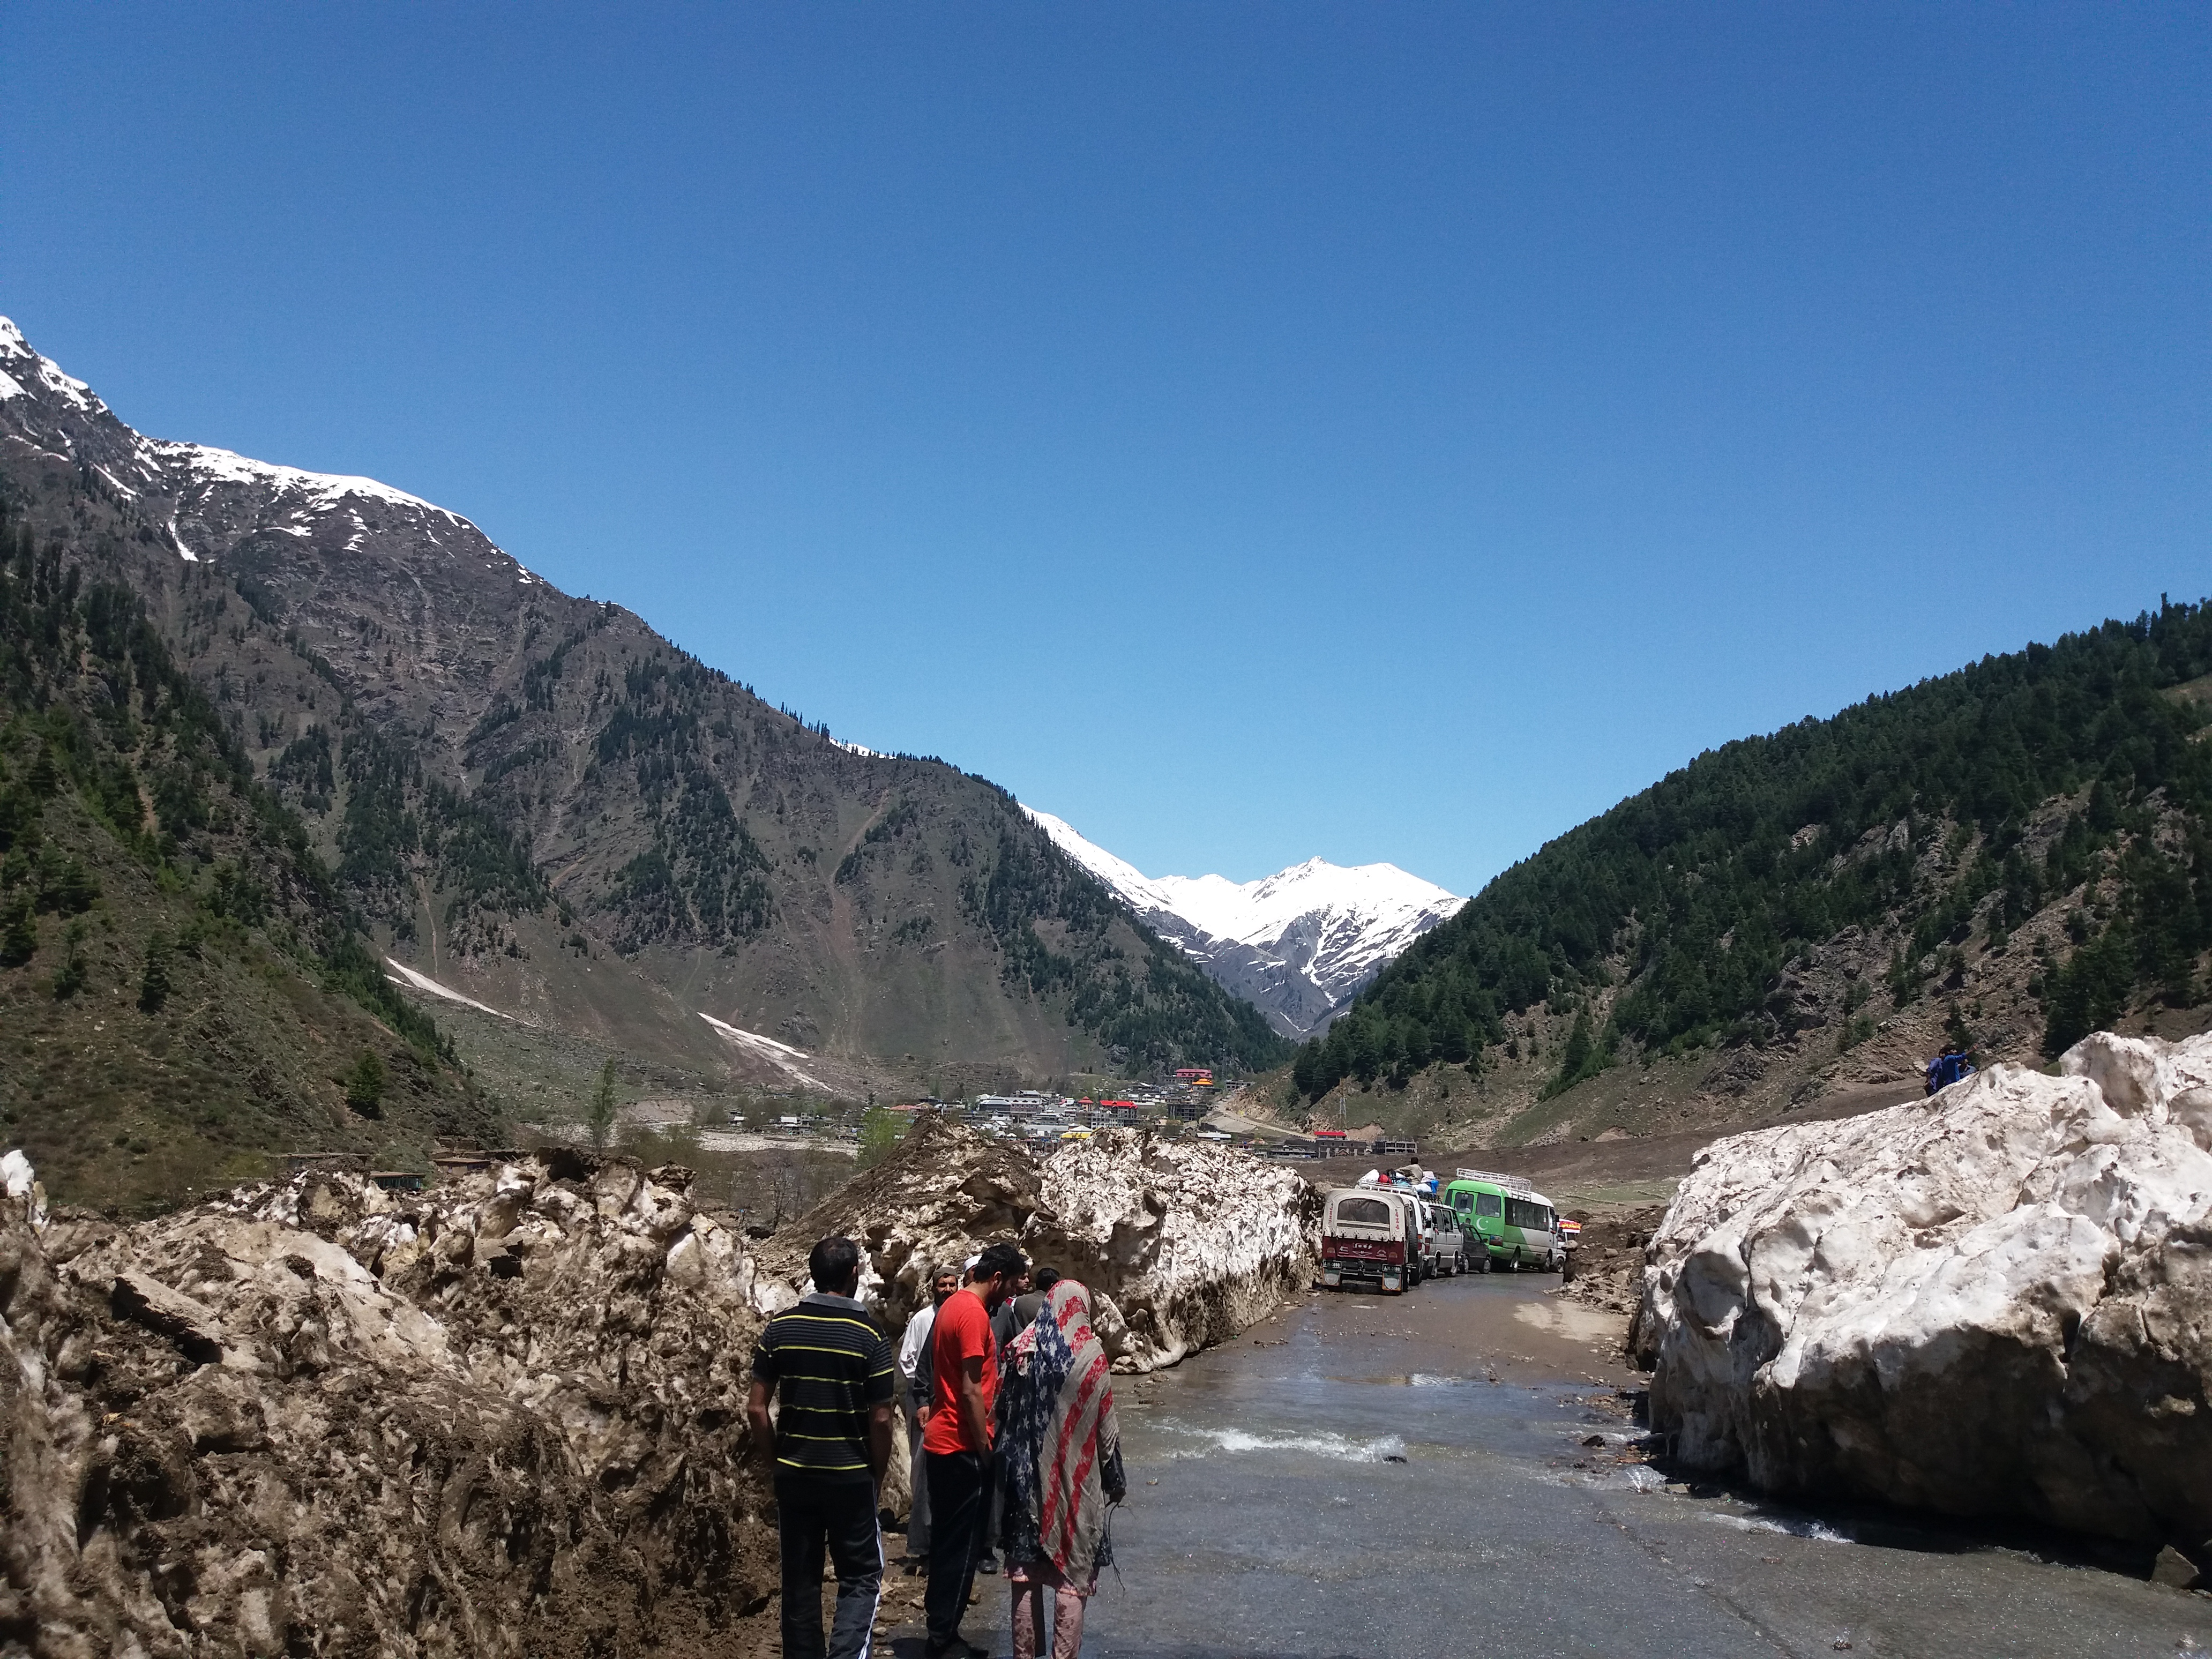 file road between the land slided snow mud glaciers jpg wikimedia